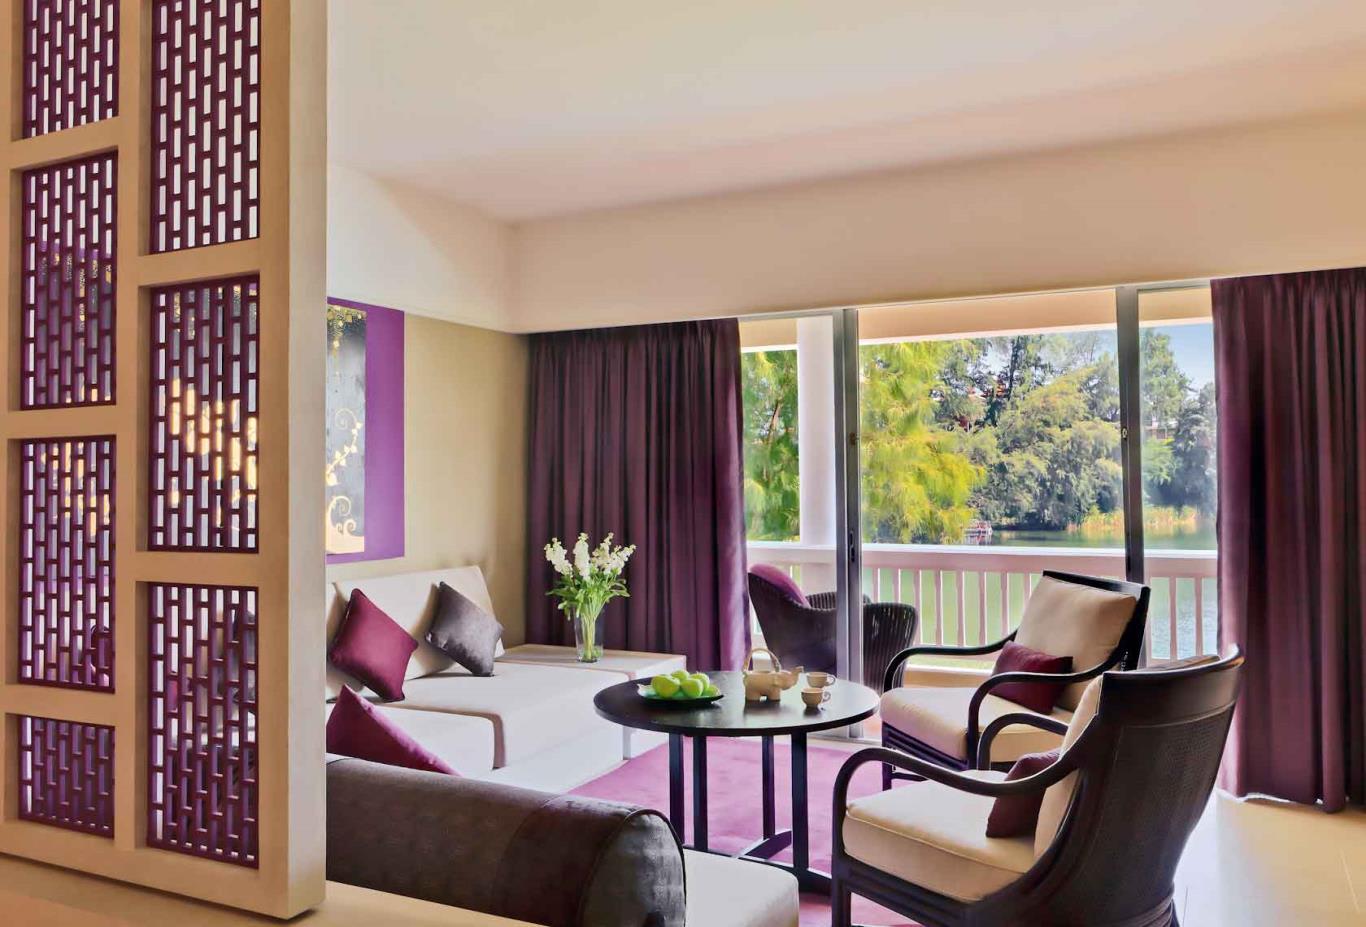 Angsana Premier Room